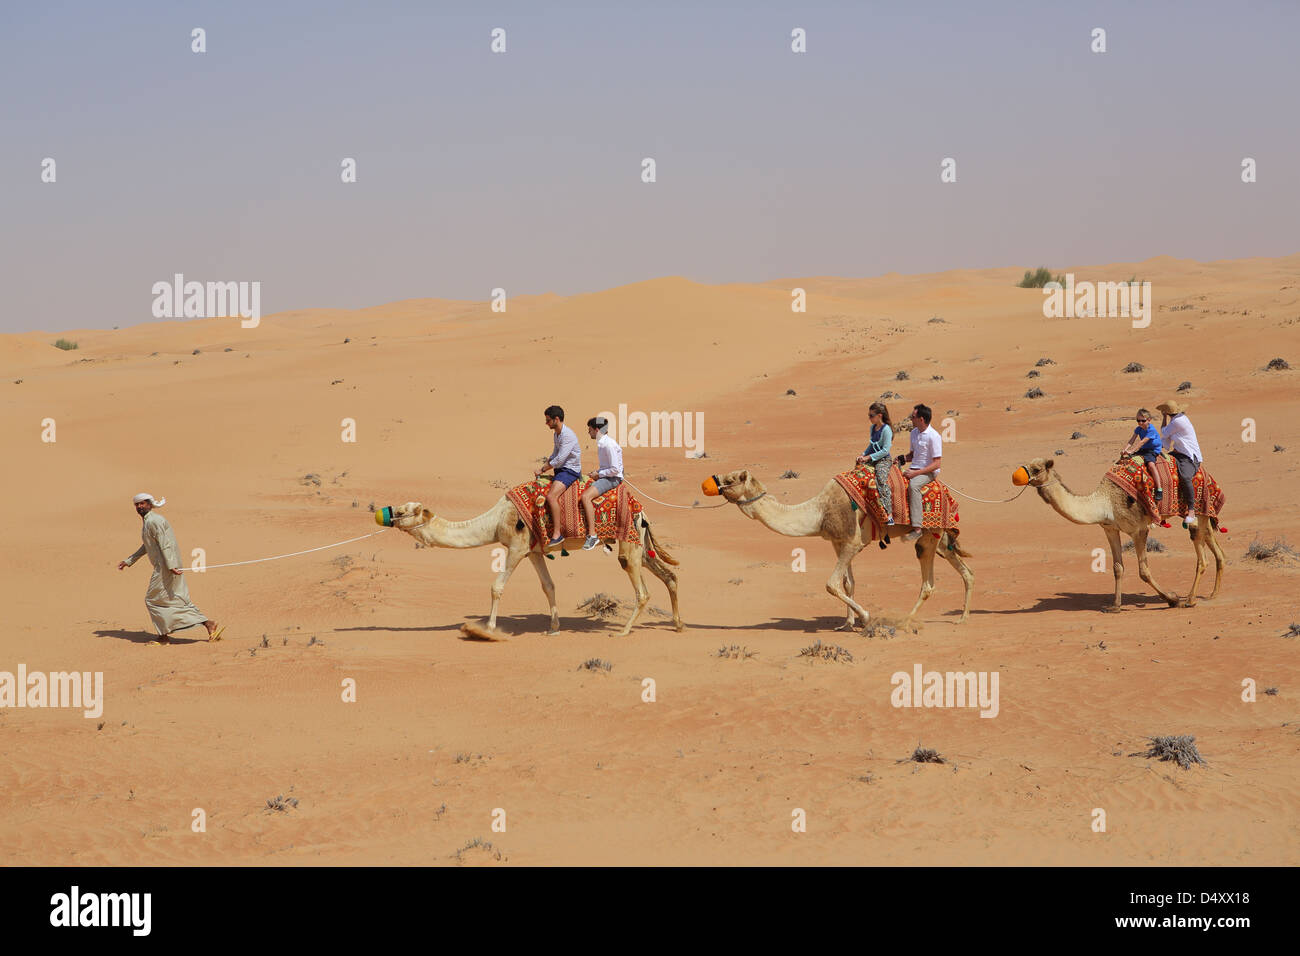 Tourists riding camels in desert, Dubai, United Arab Emirates - Stock Image